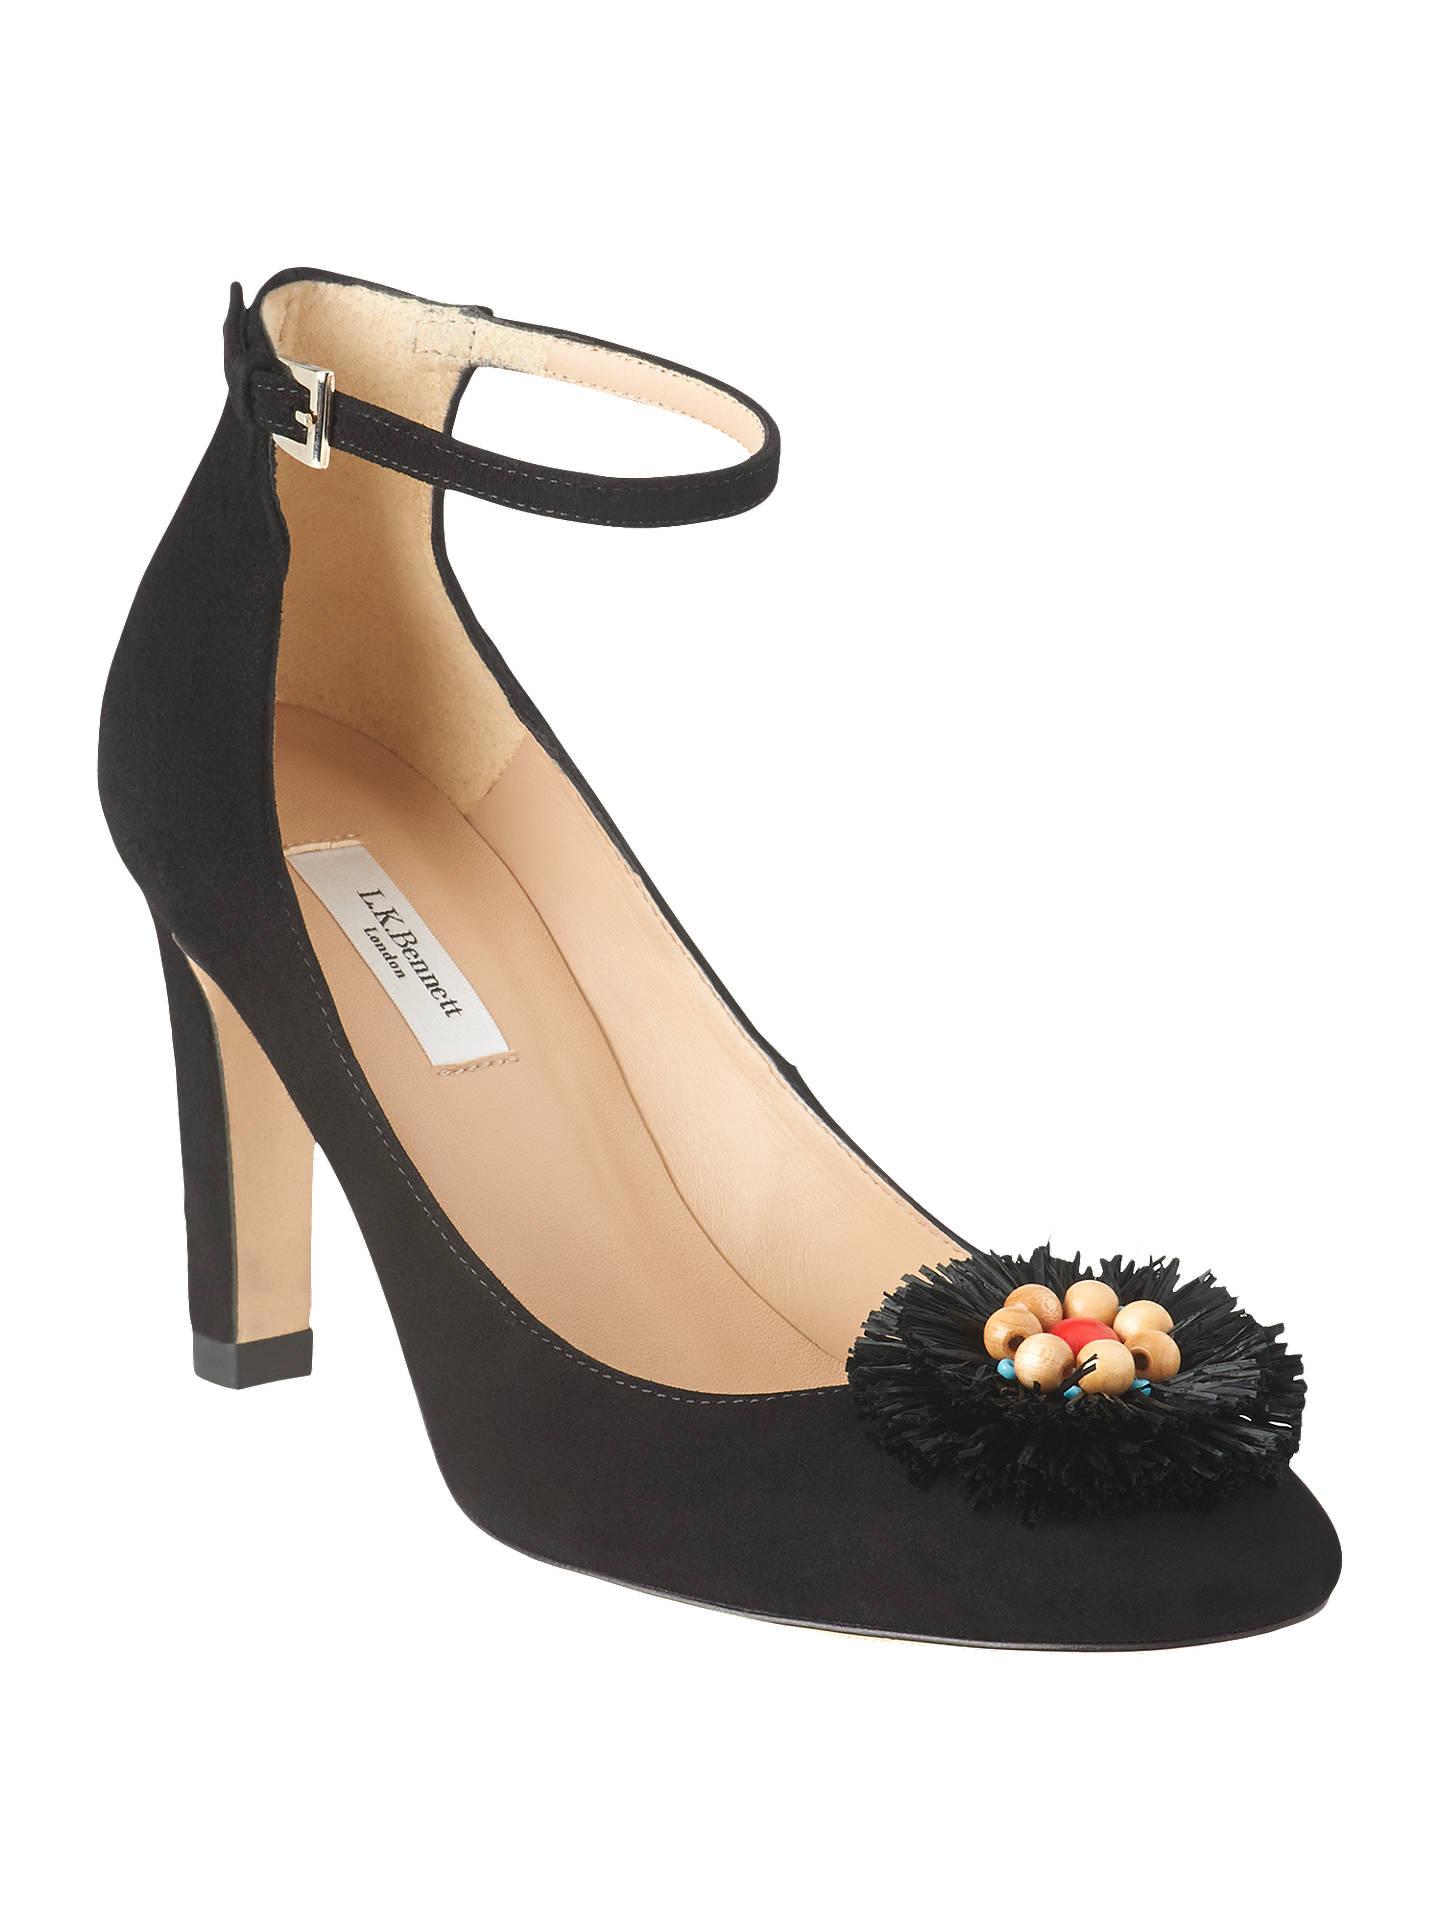 3fd97b8c3e7f5f Buy L.K.Bennett Gwen Flower Court Shoes, Black Suede, 2 Online at johnlewis.